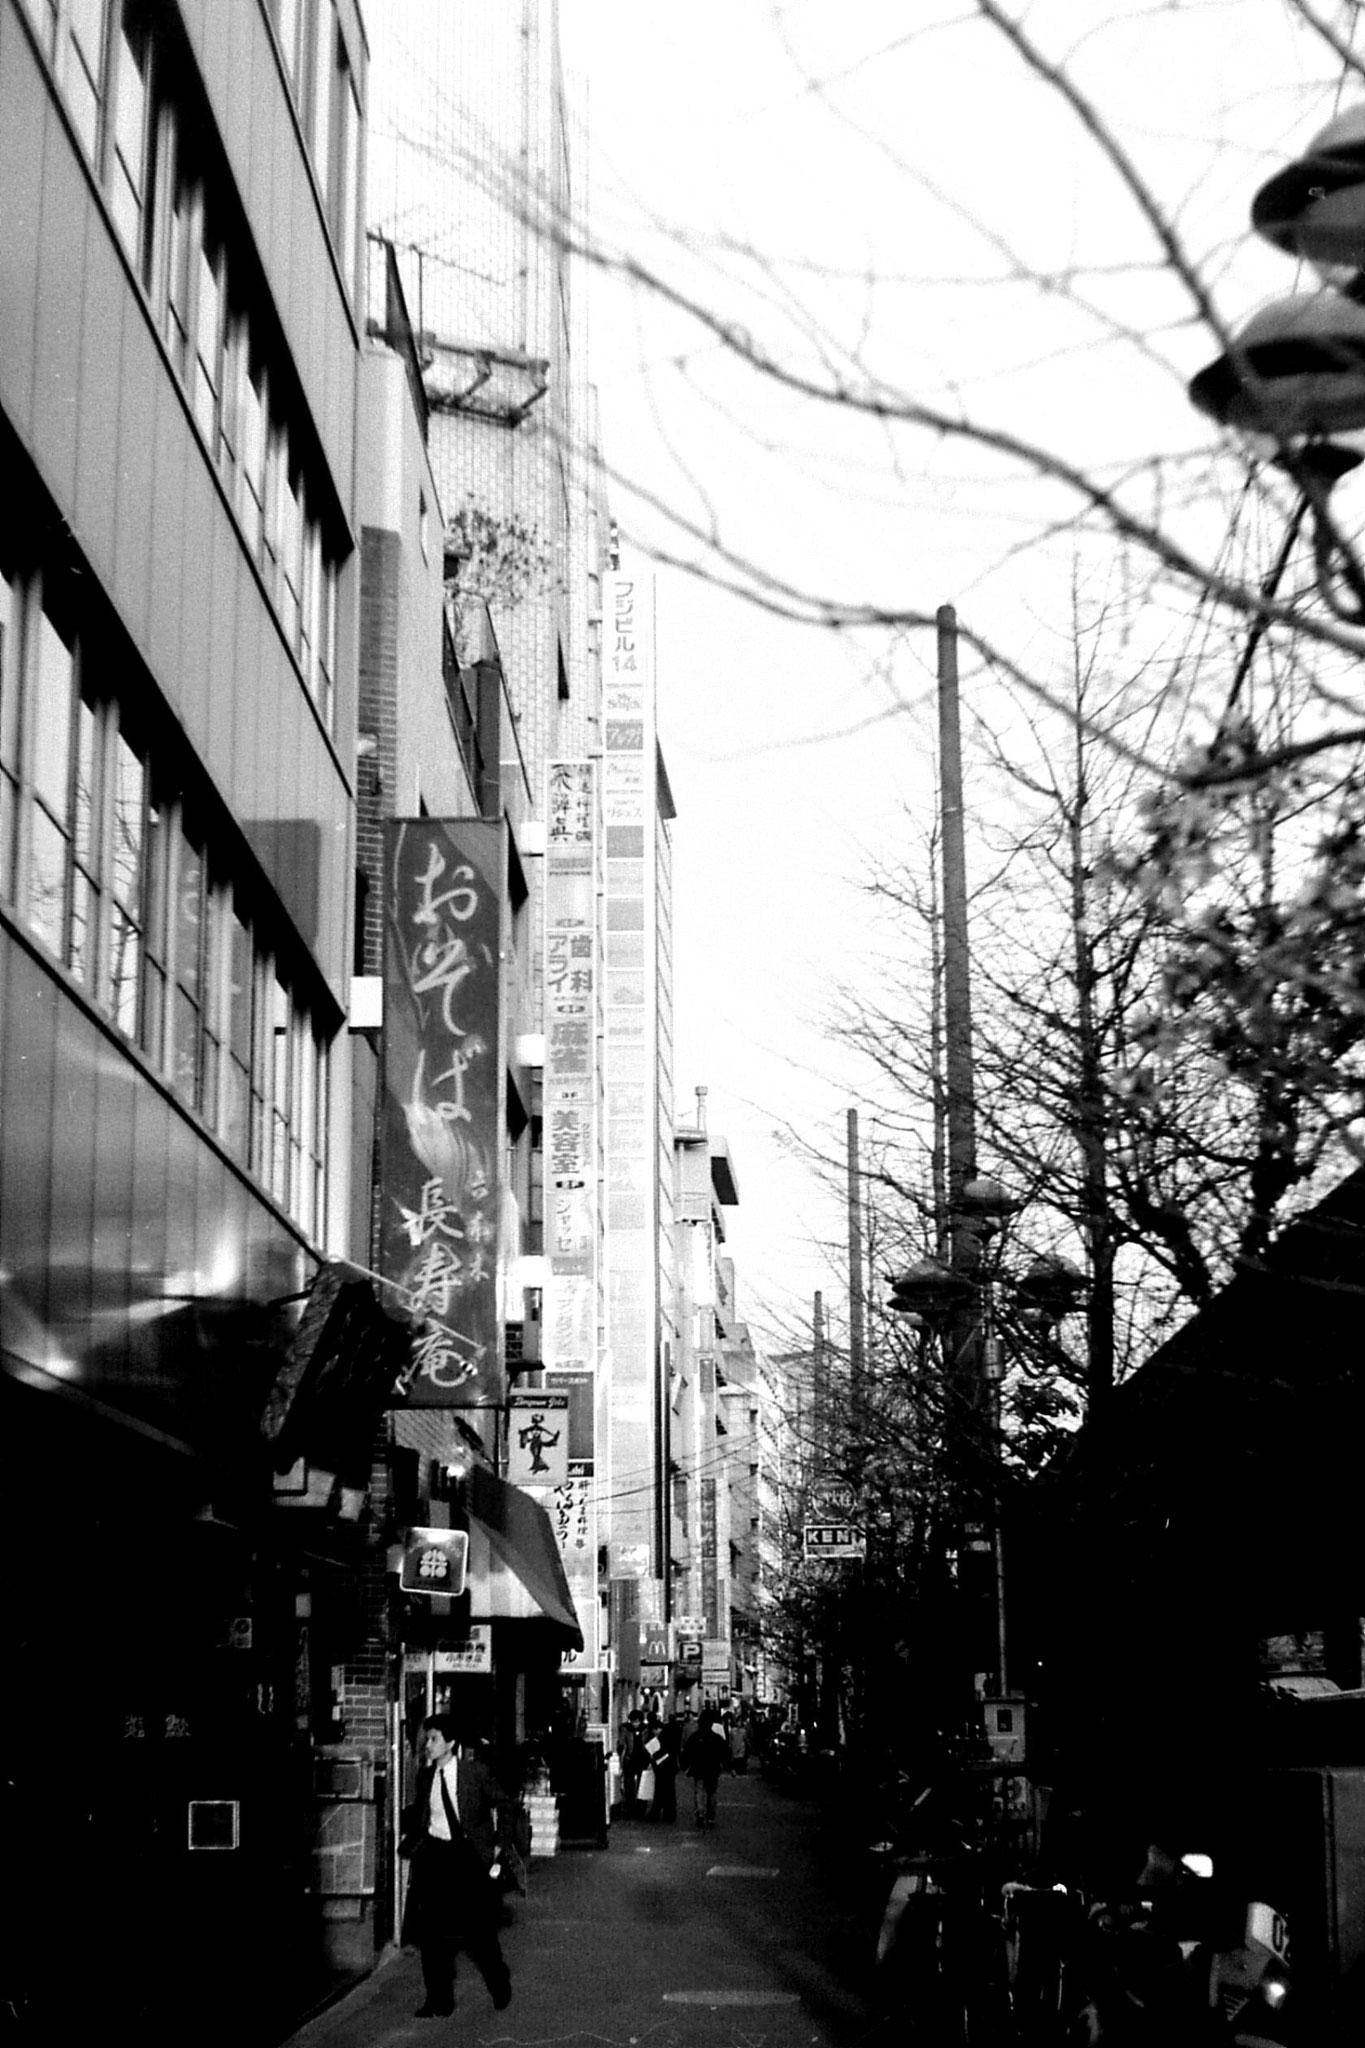 23/12/1988: 18: Tokyo